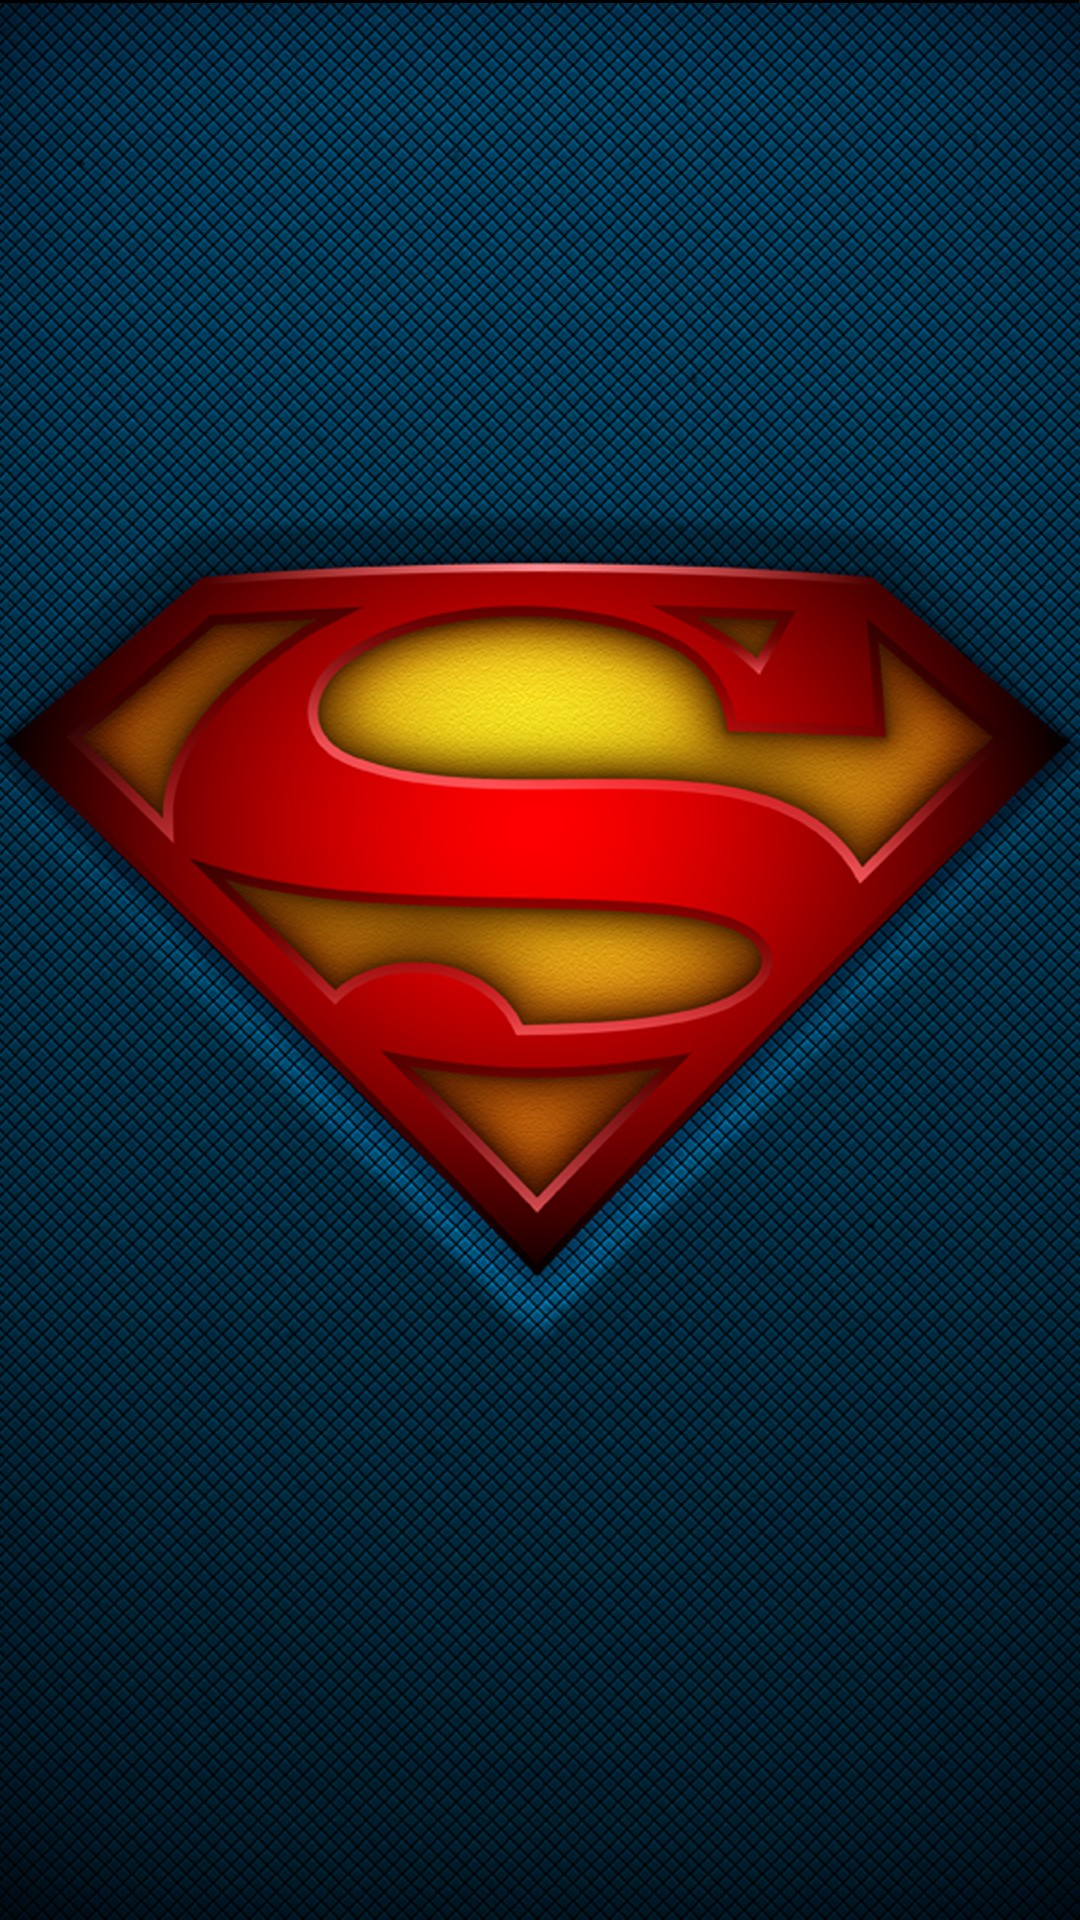 Superhero Wallpaper 11 - [1080x1920]